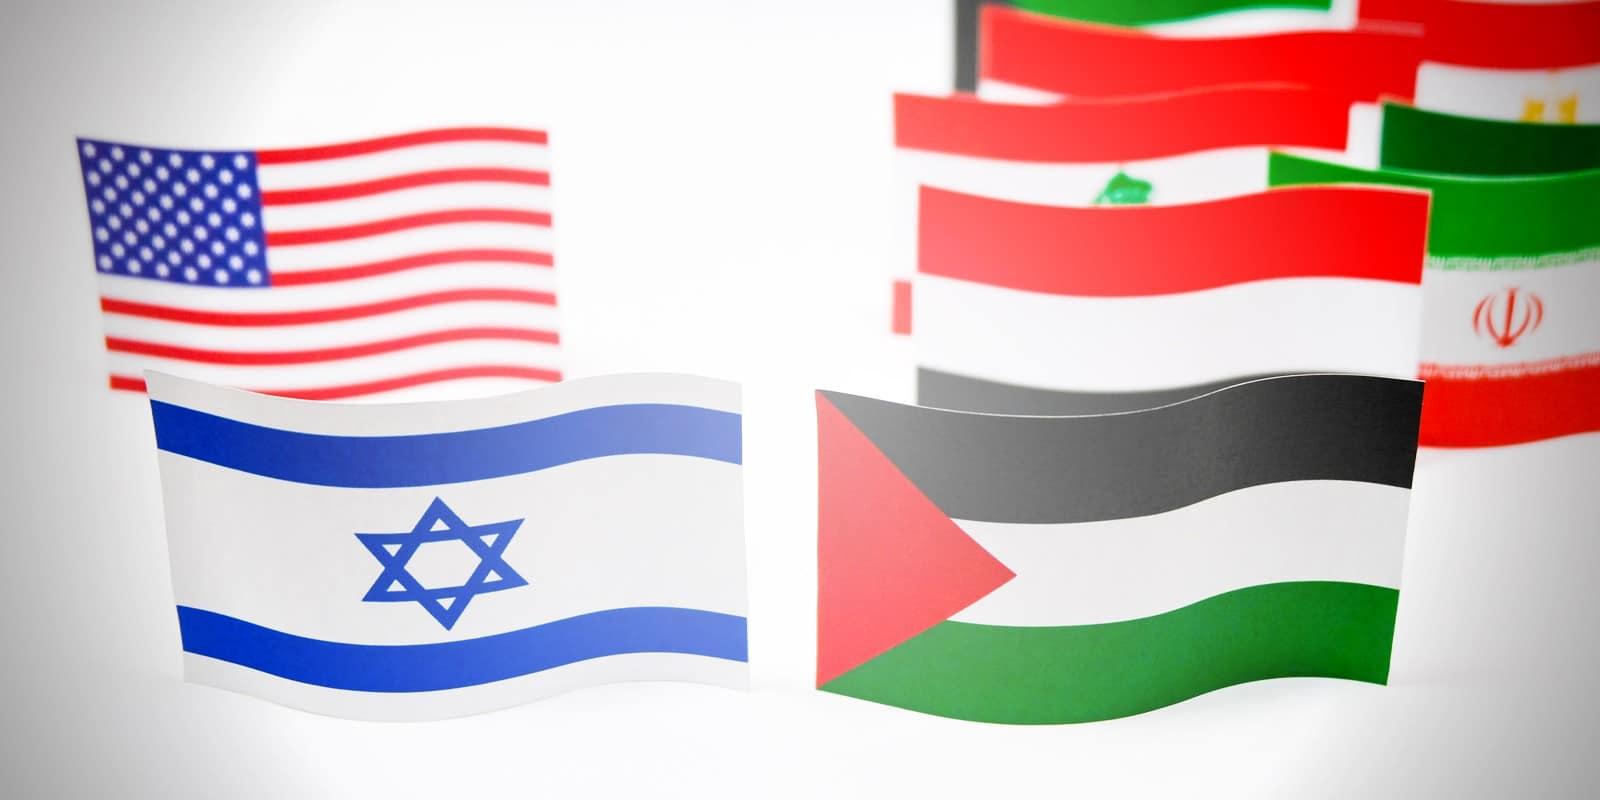 USA ISRAEL PA FLAGS